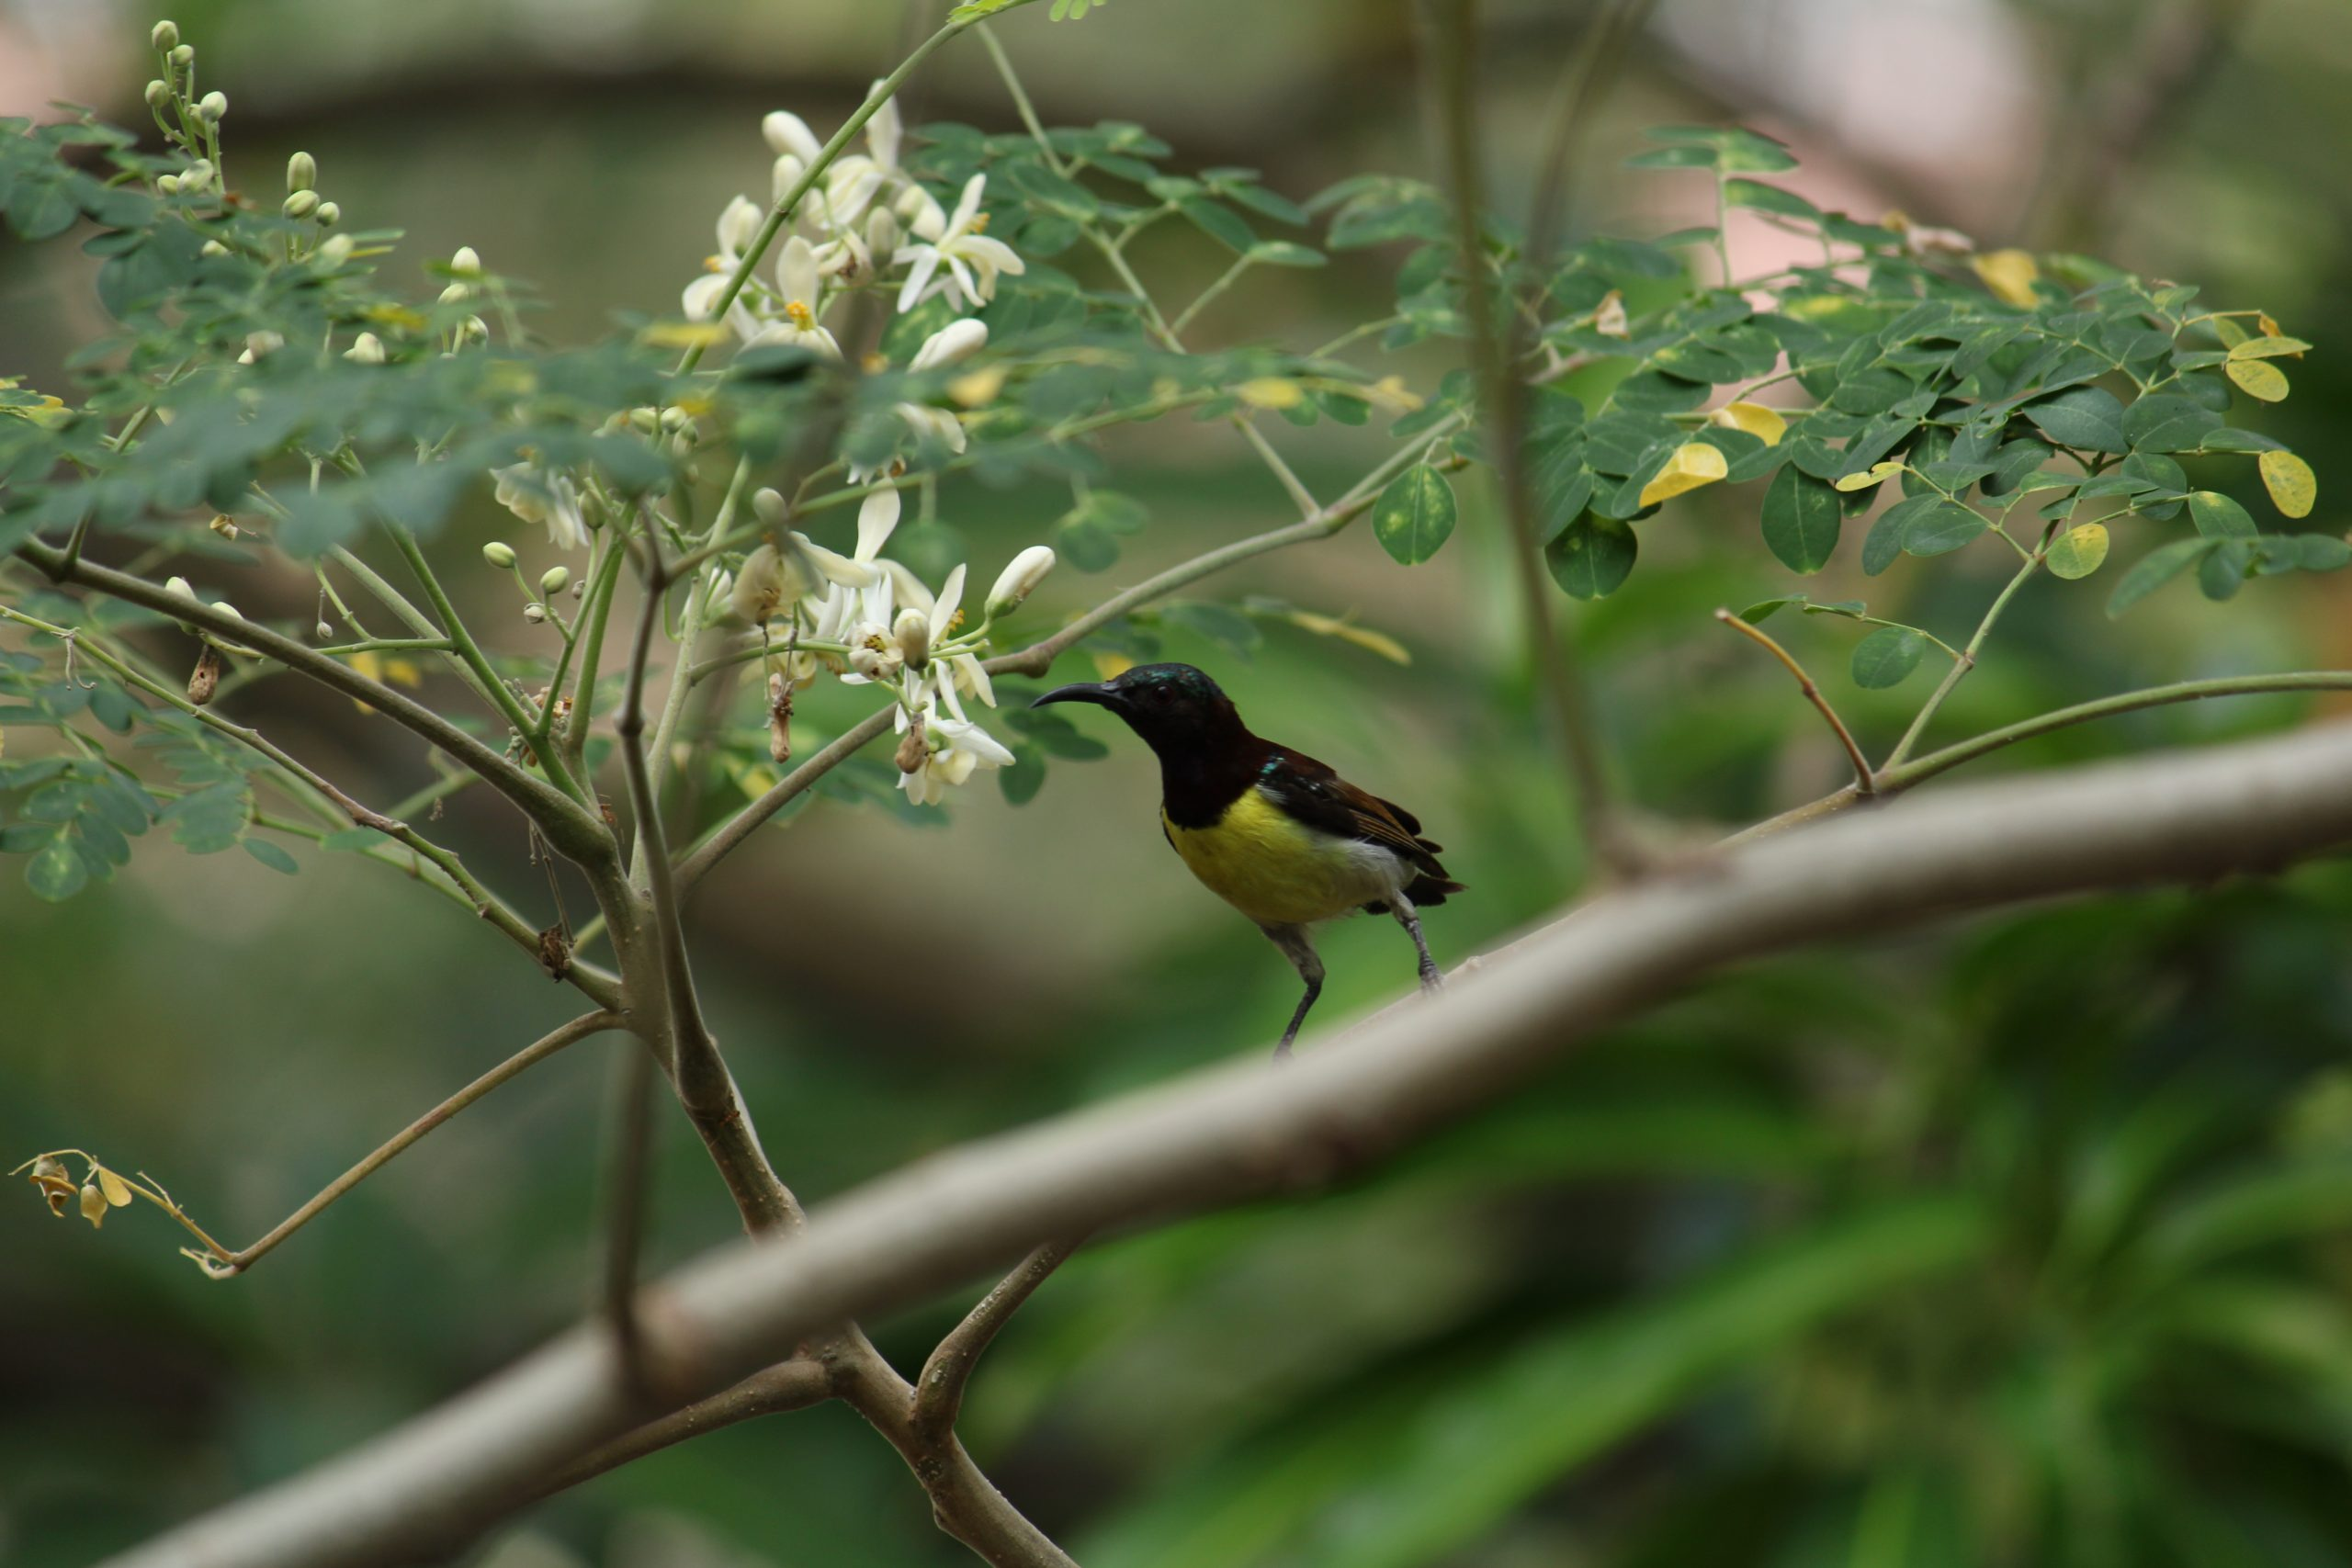 A bird sitting on a tree.